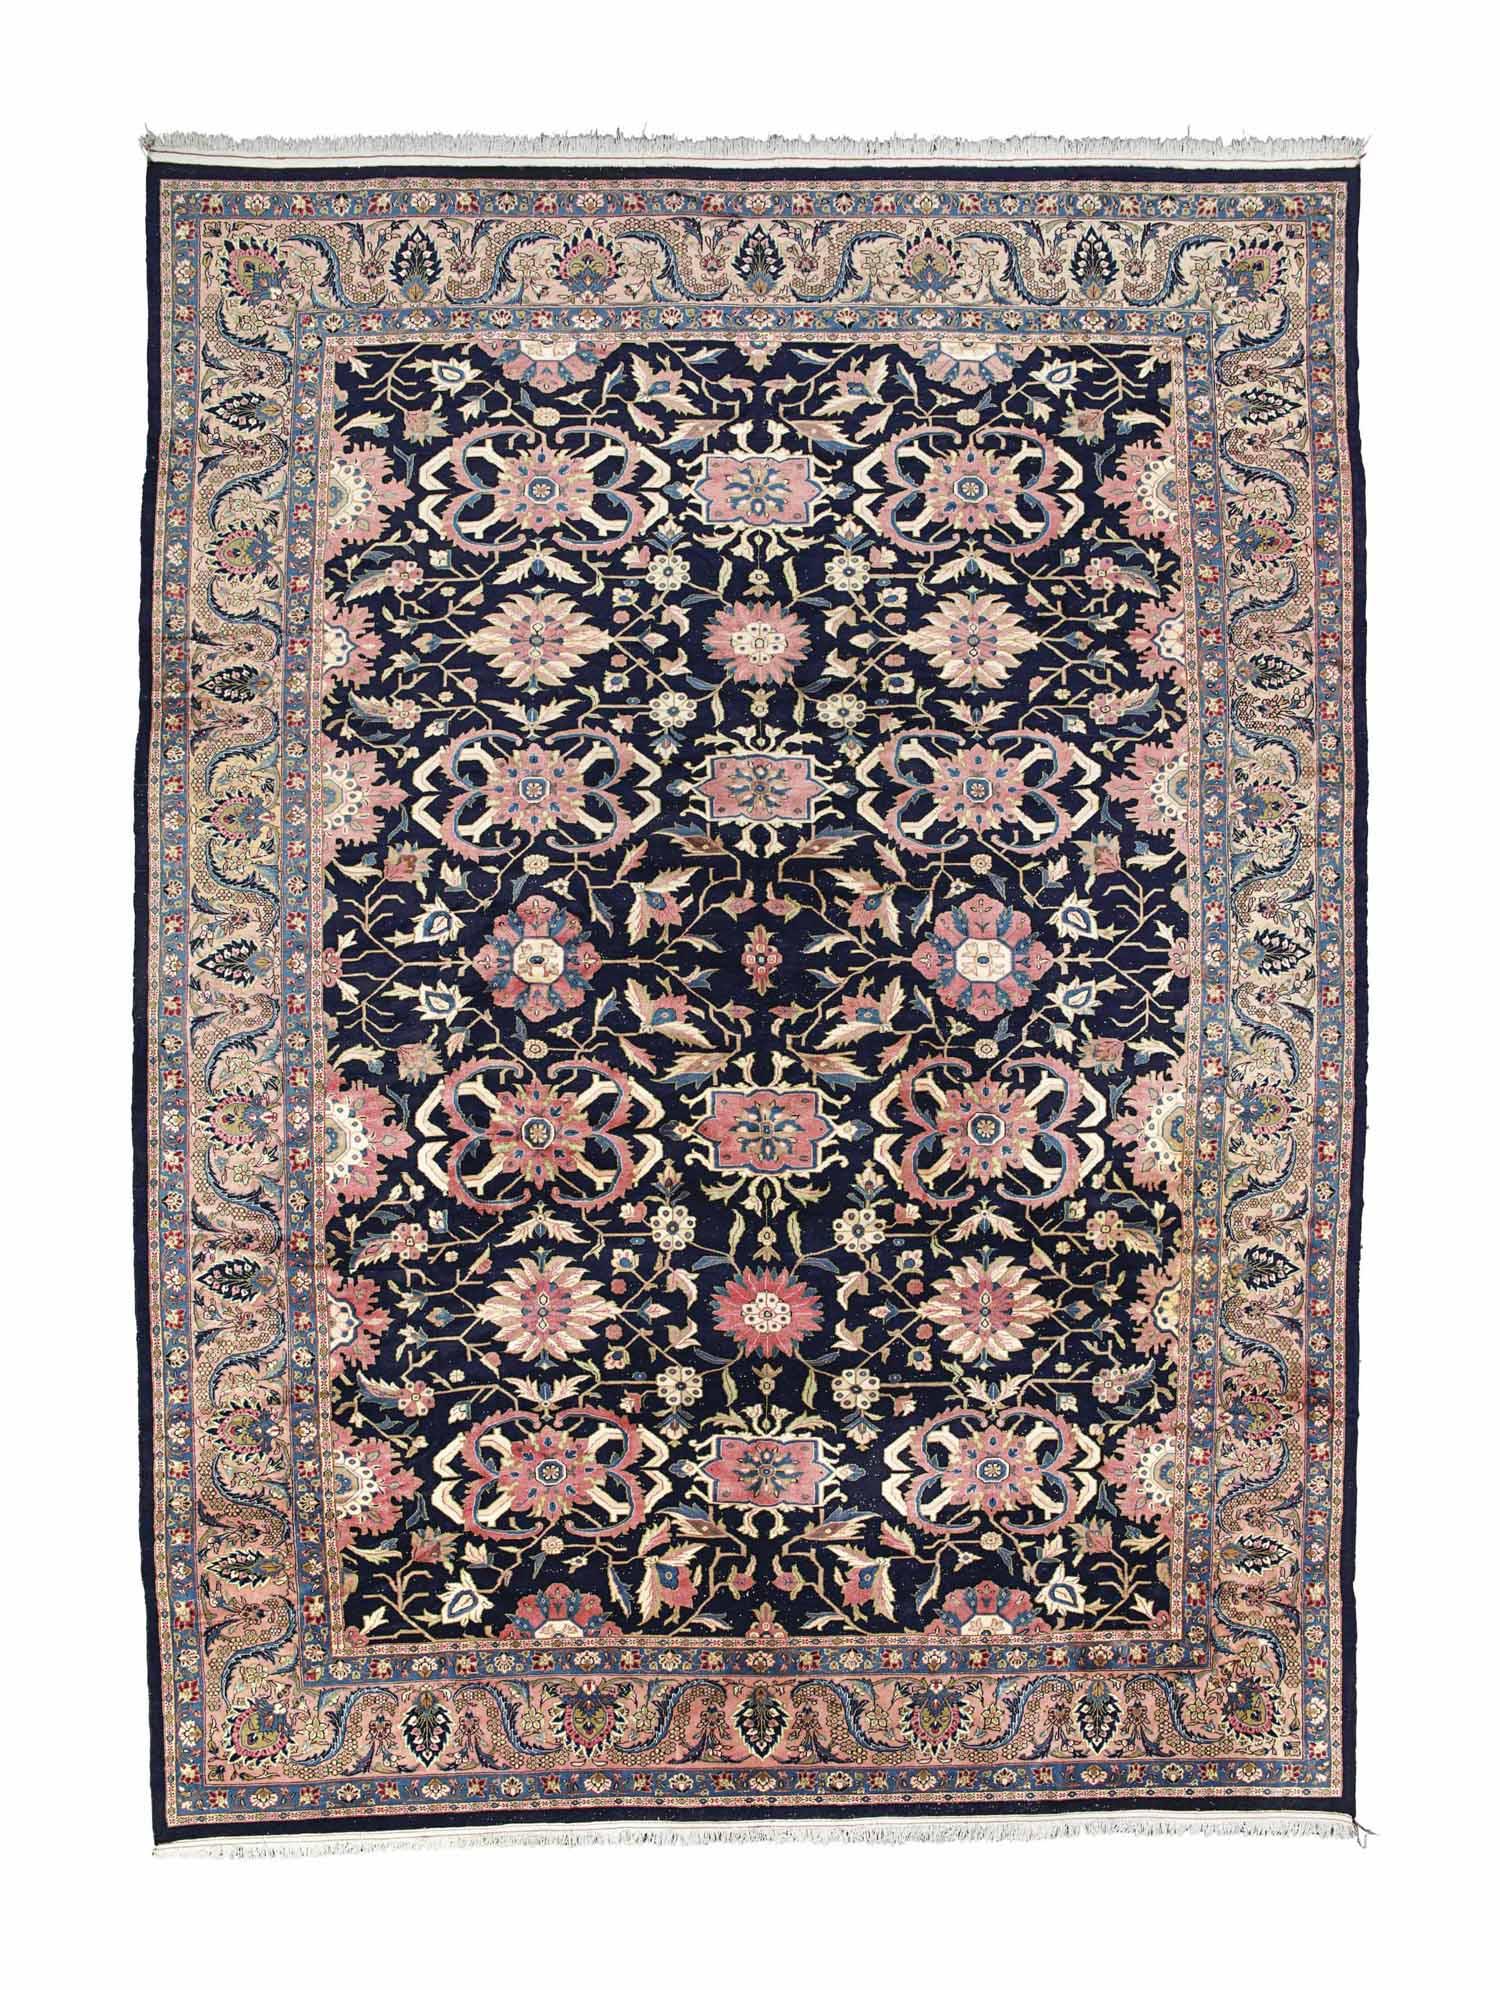 A large West Persian carpet